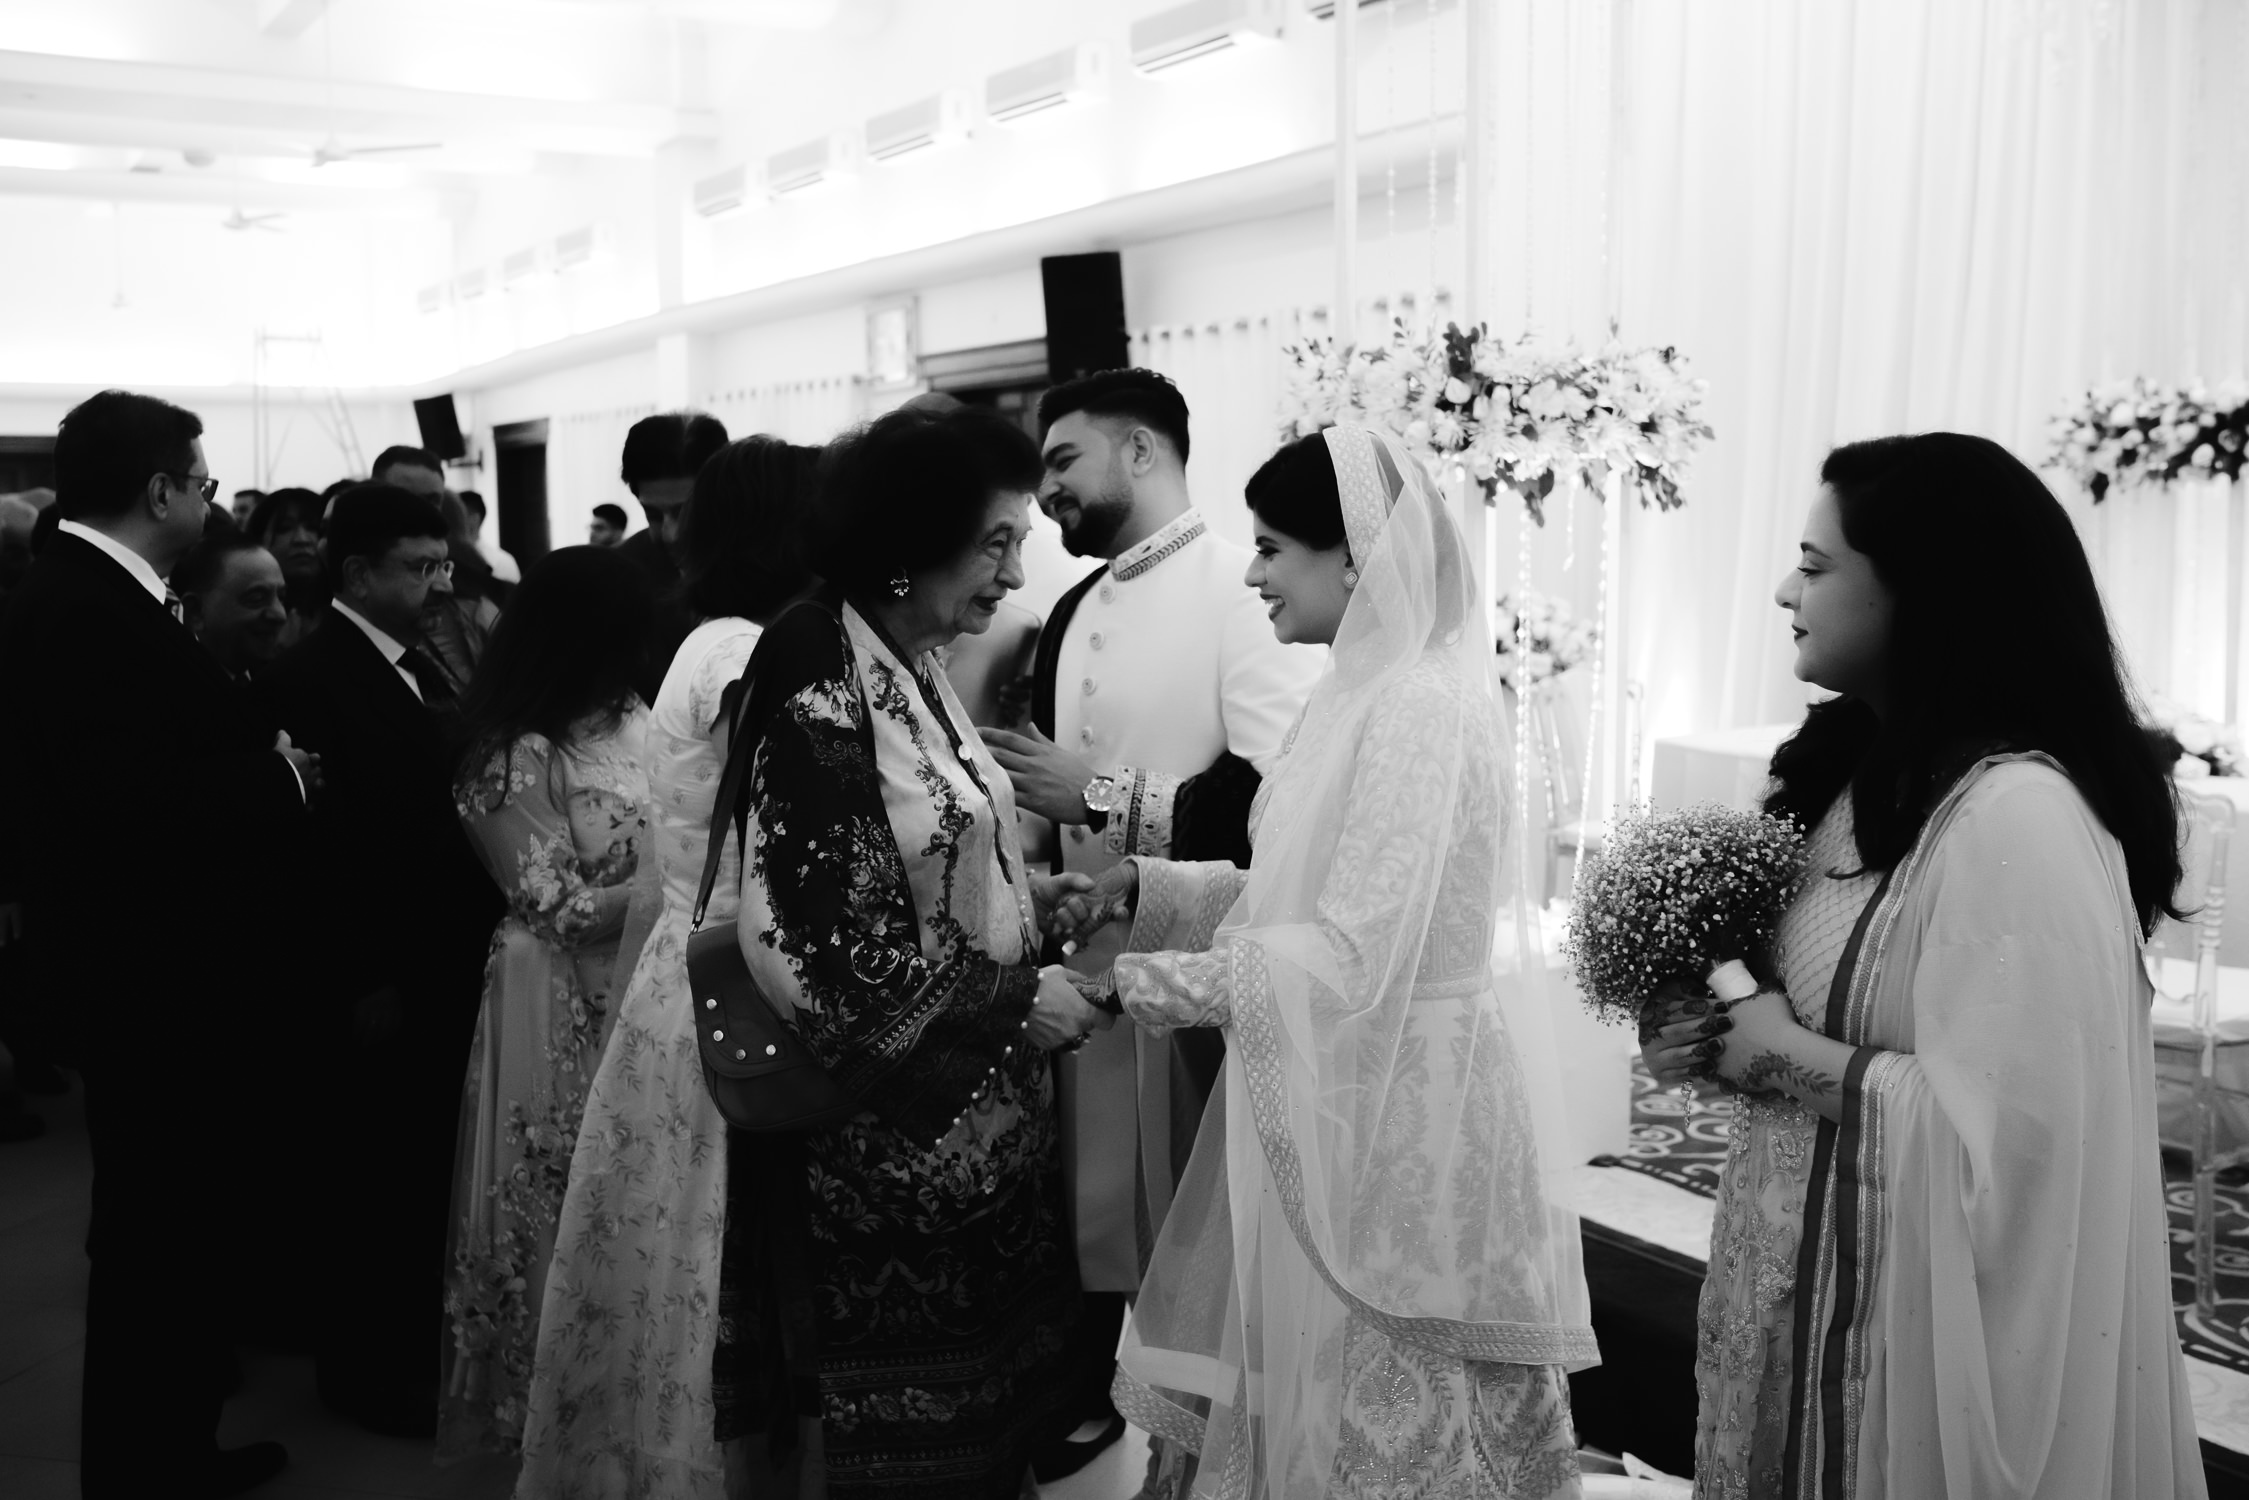 destination-wedding-photographer-amsterdam-Aqil Benazir-389-2.jpg